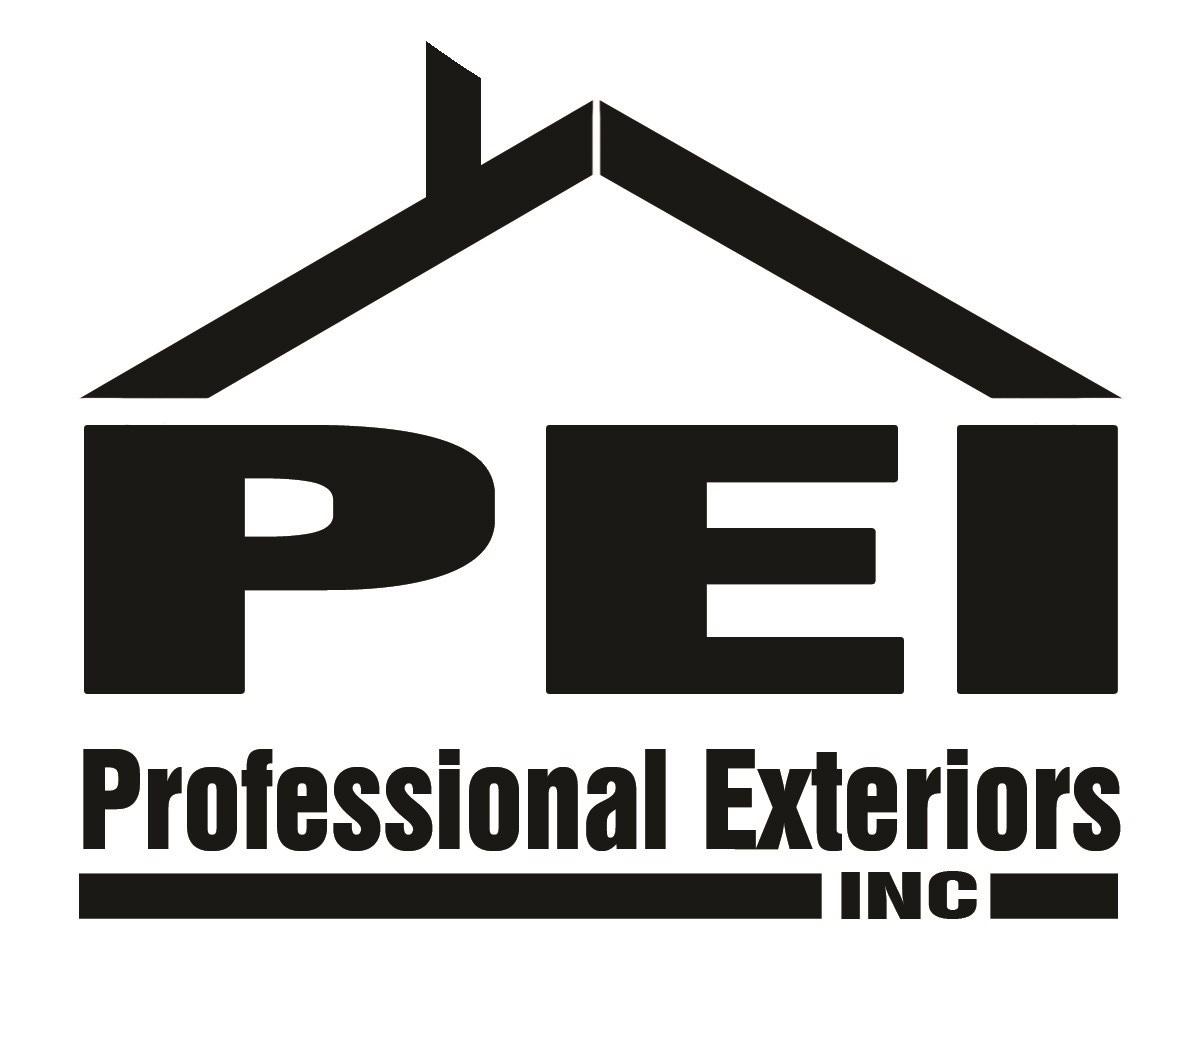 Professional Exteriors, Inc